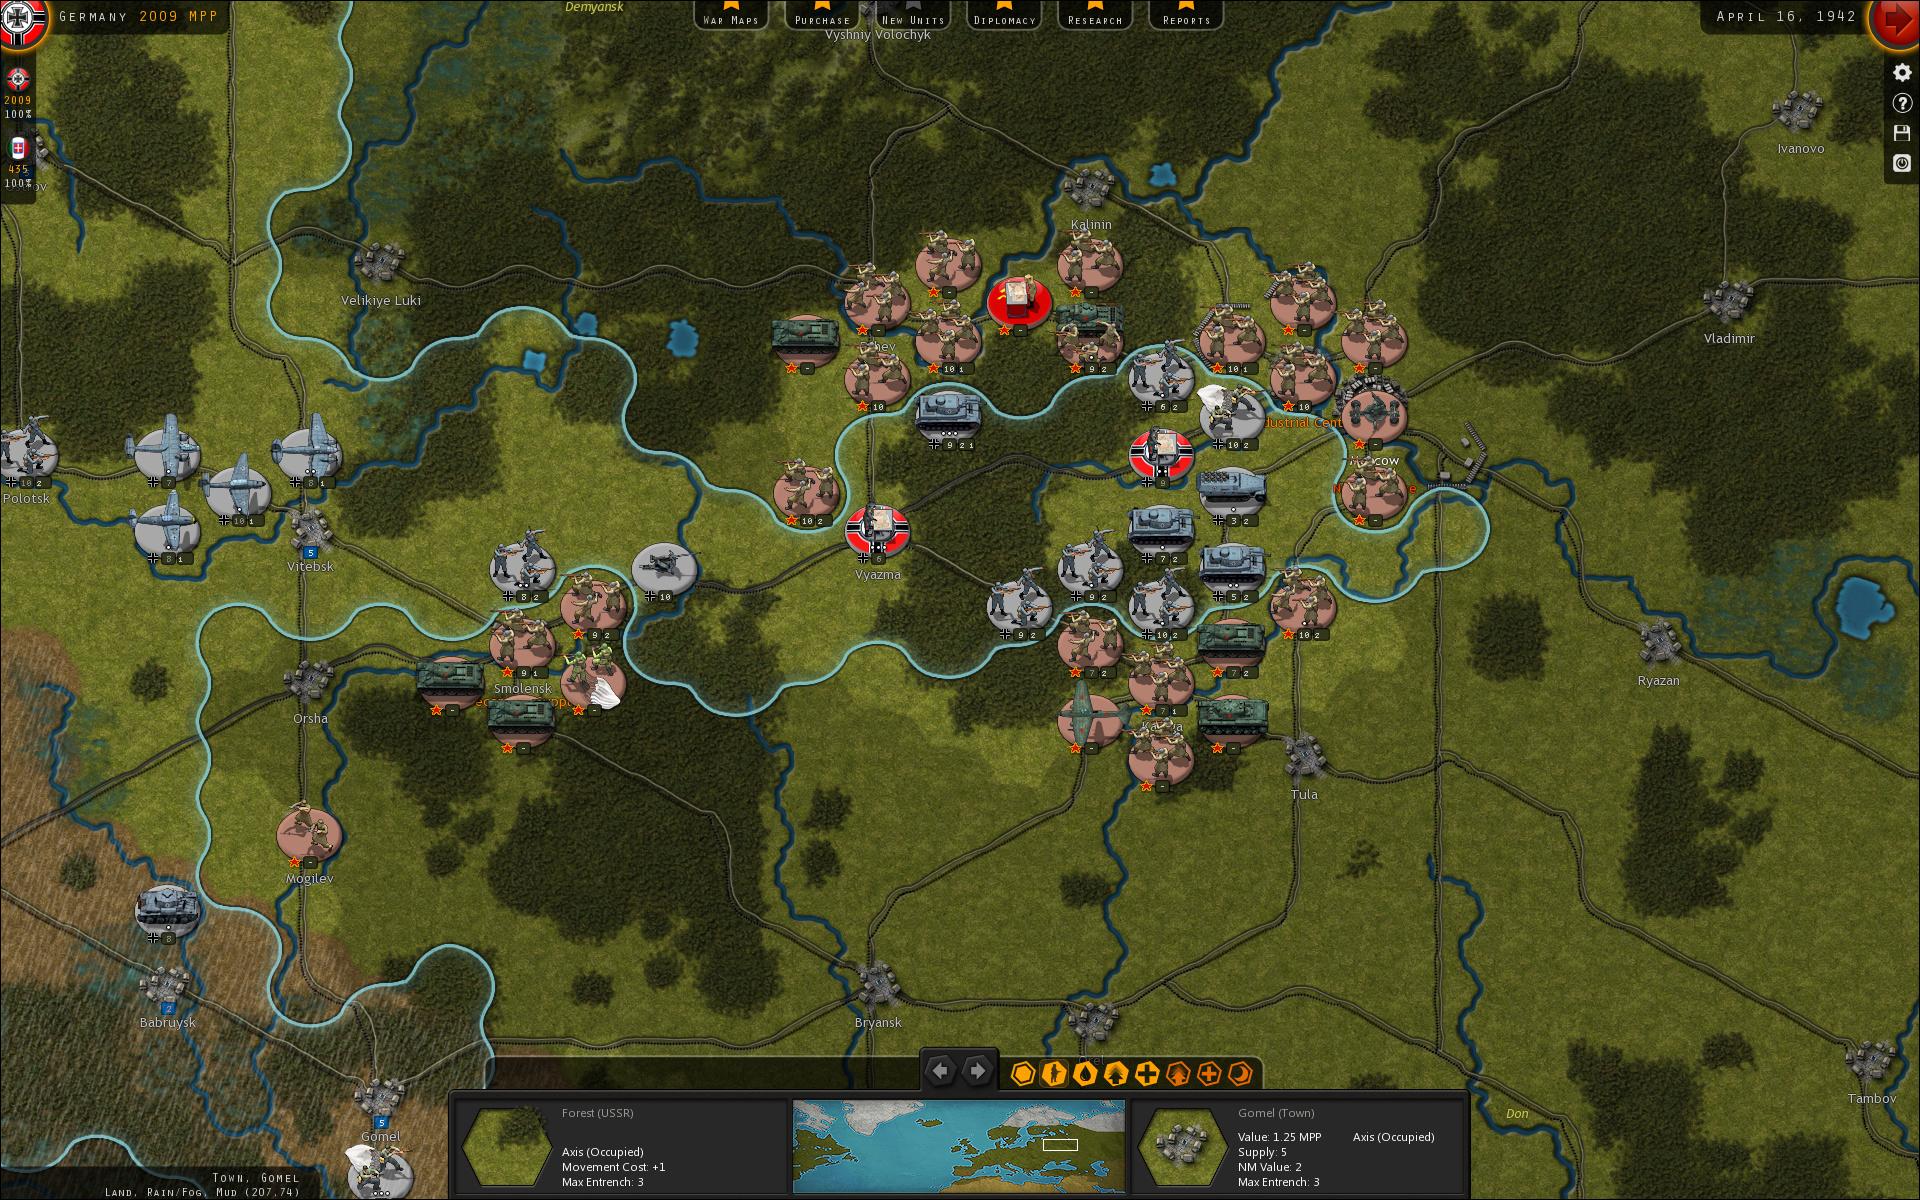 Strategic Command WW2 - War in Europe is amazing (biased